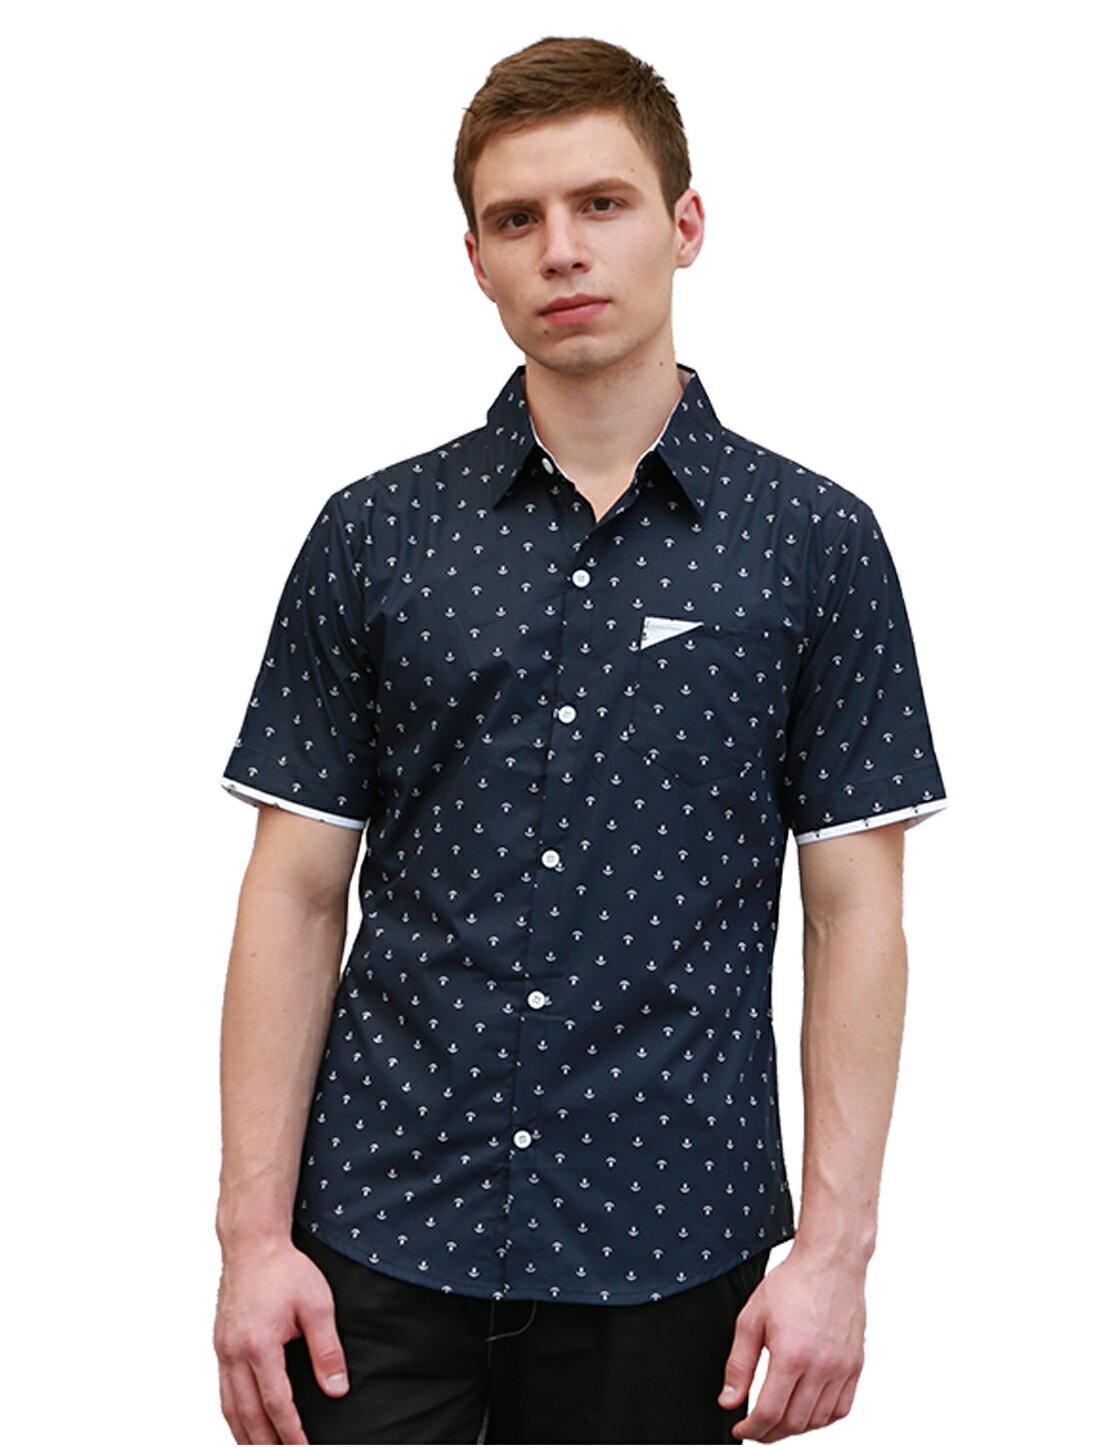 Unique Bargains Men s Point Collar Button Down Short Sleeve Anchor Pattern  Casual Shirt Blue (Size 640bbd6e0